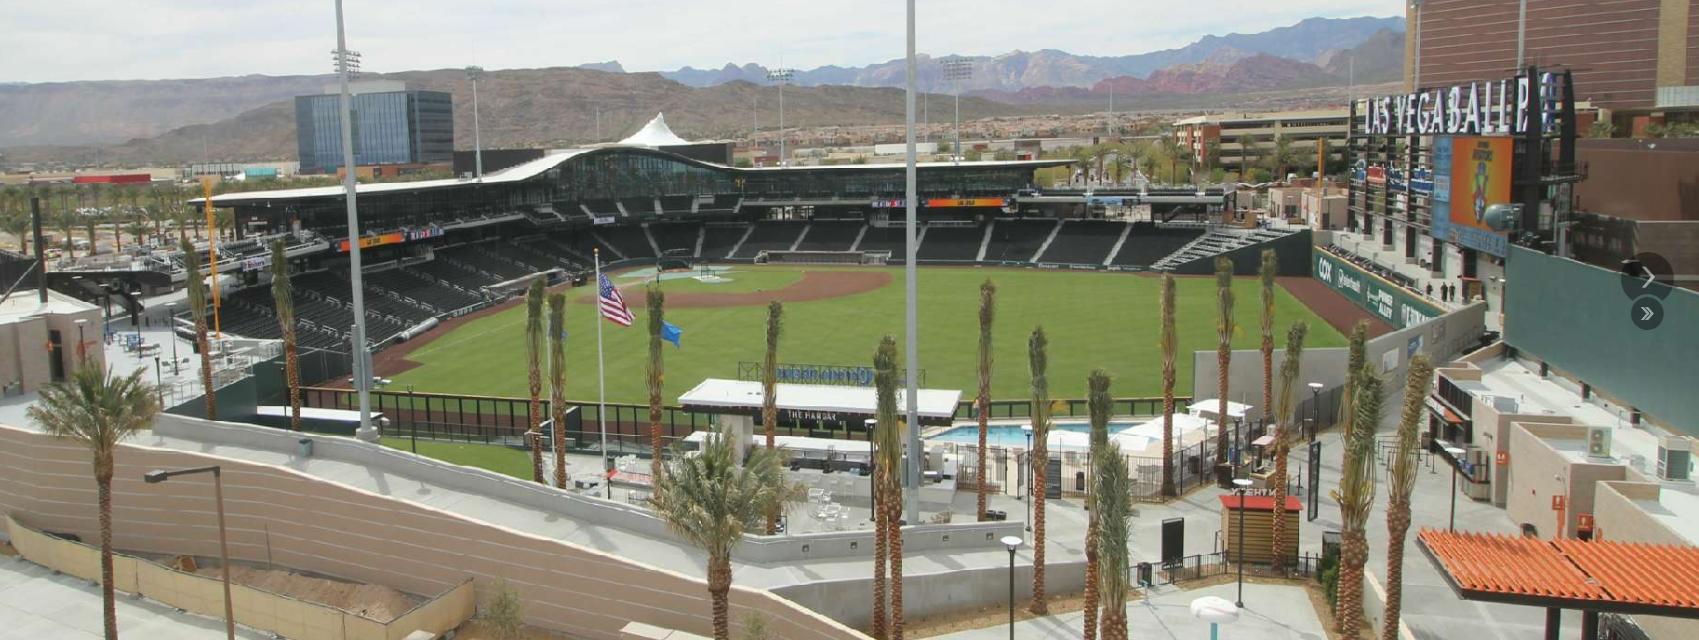 Las Vegas Ballpark in Downtown Summerlin